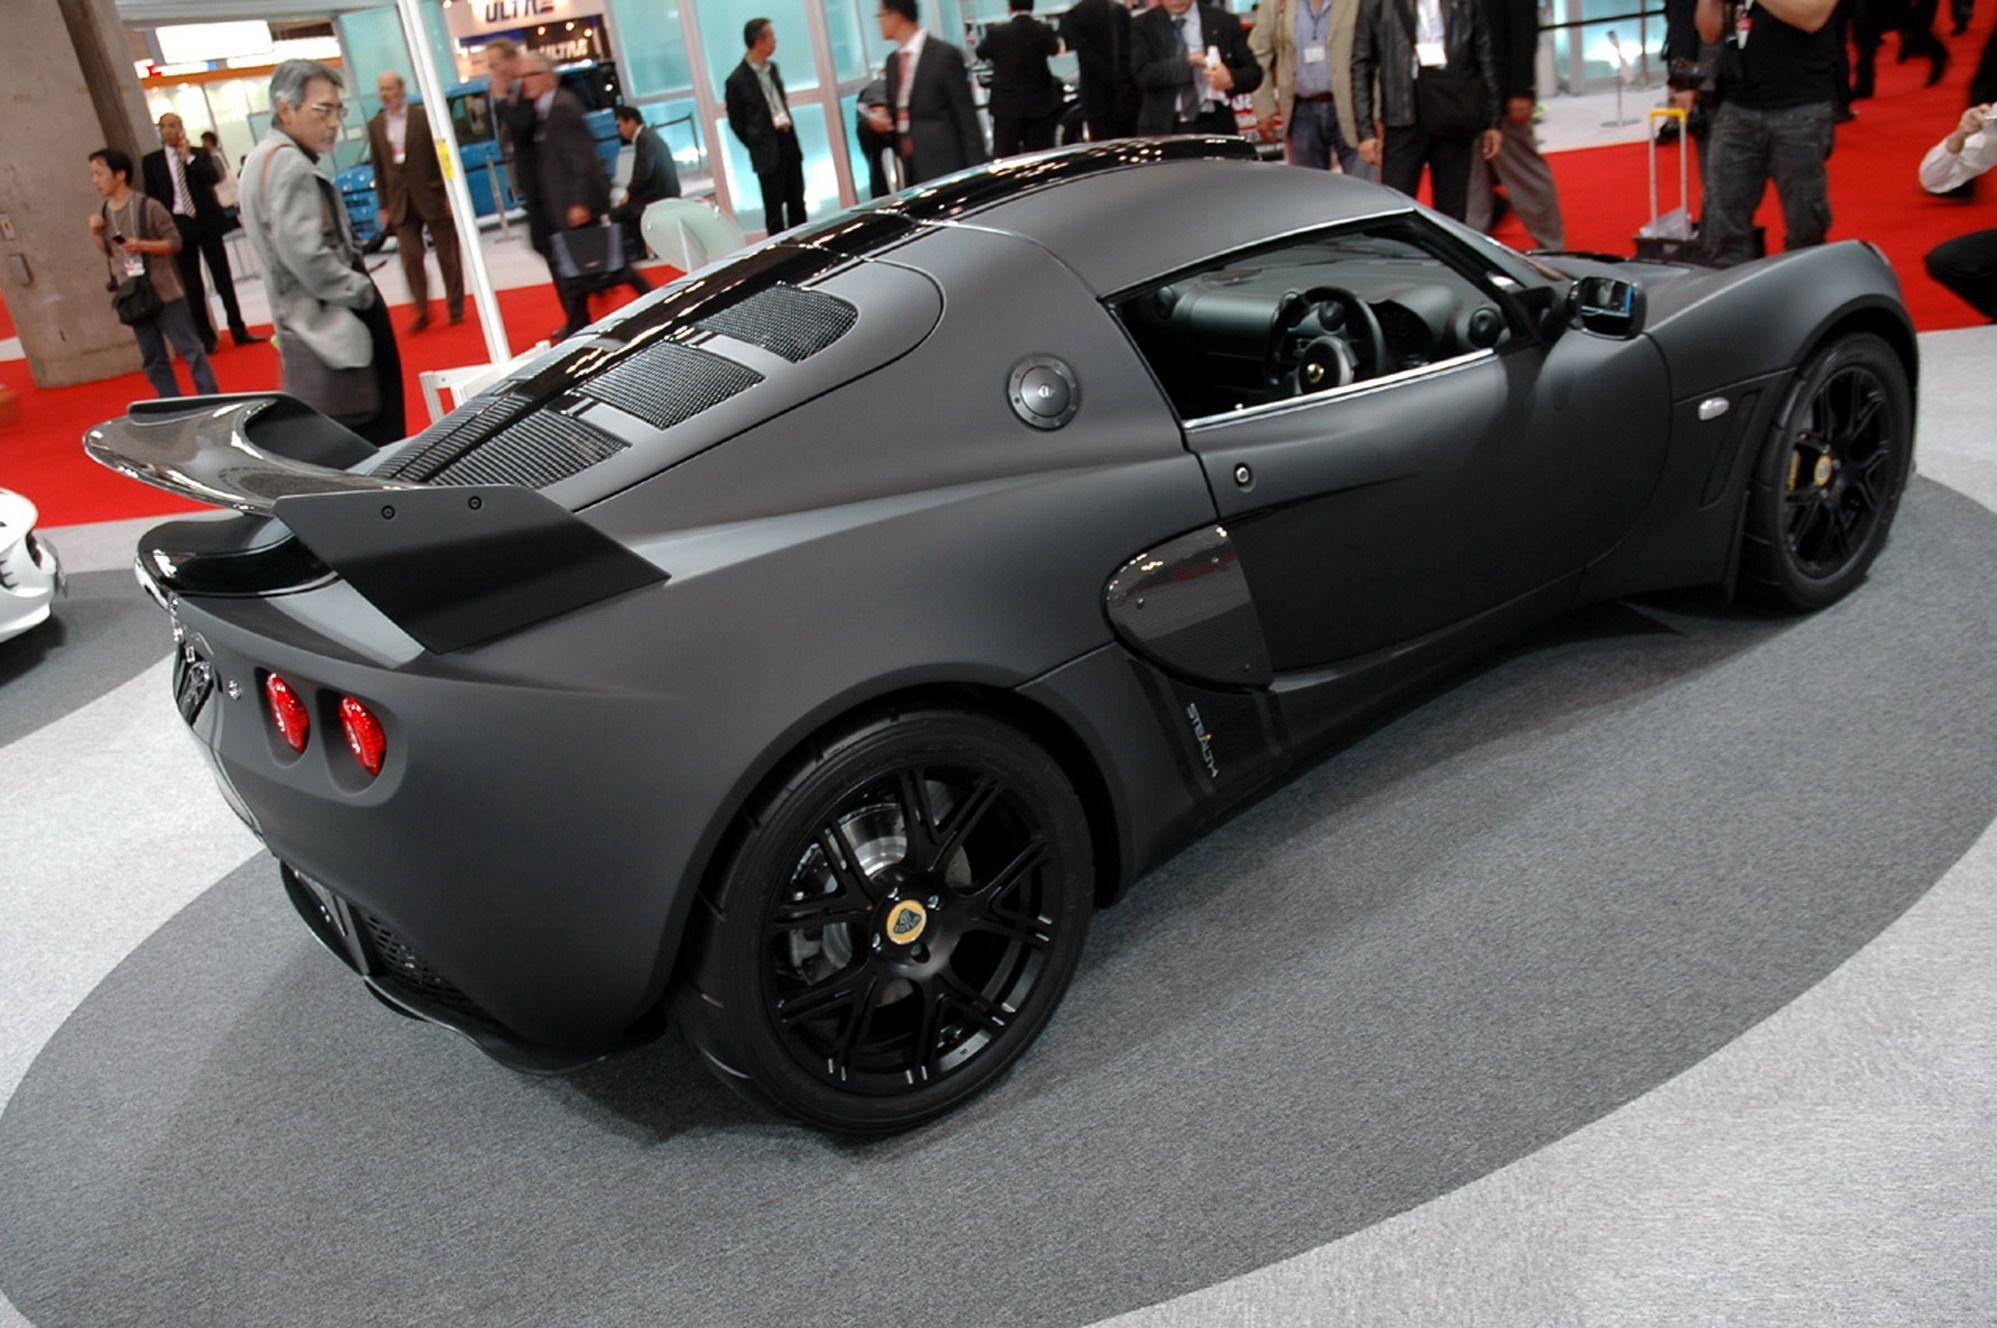 Exceptional Black Matte Car   Google Search Design Ideas